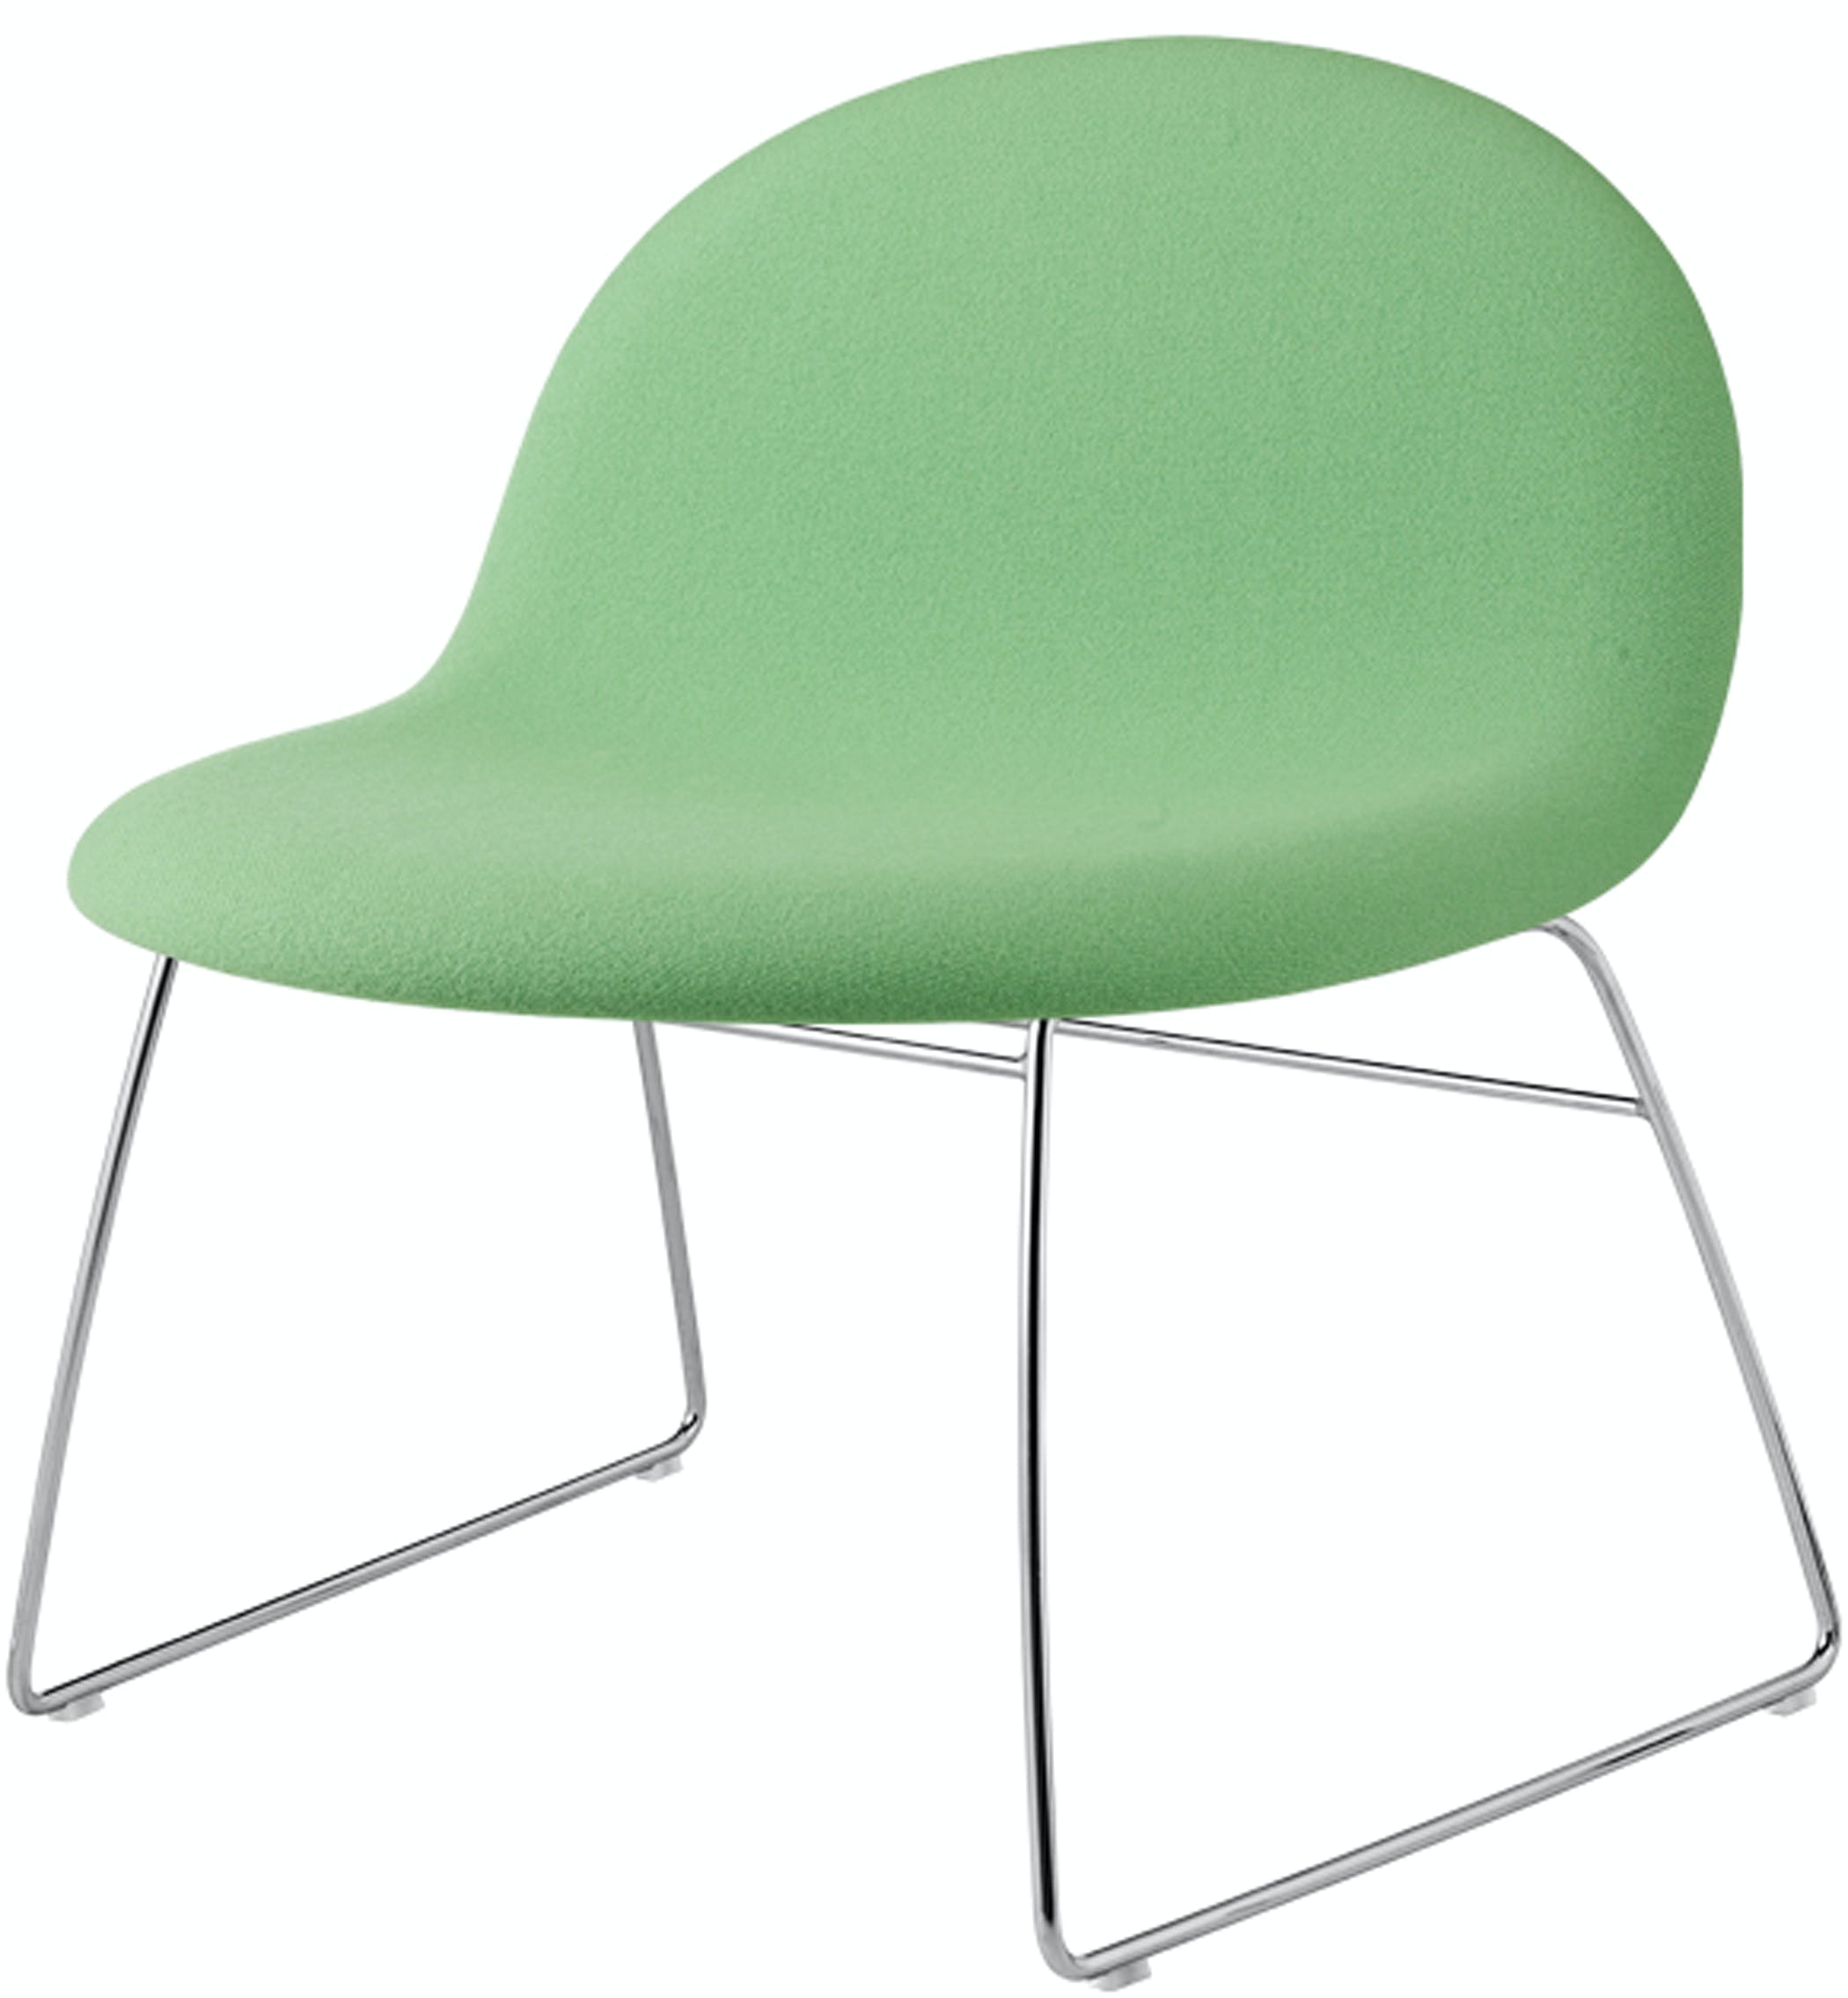 Gubi Lounge Fully Upholstred Green Crome Base Front Product